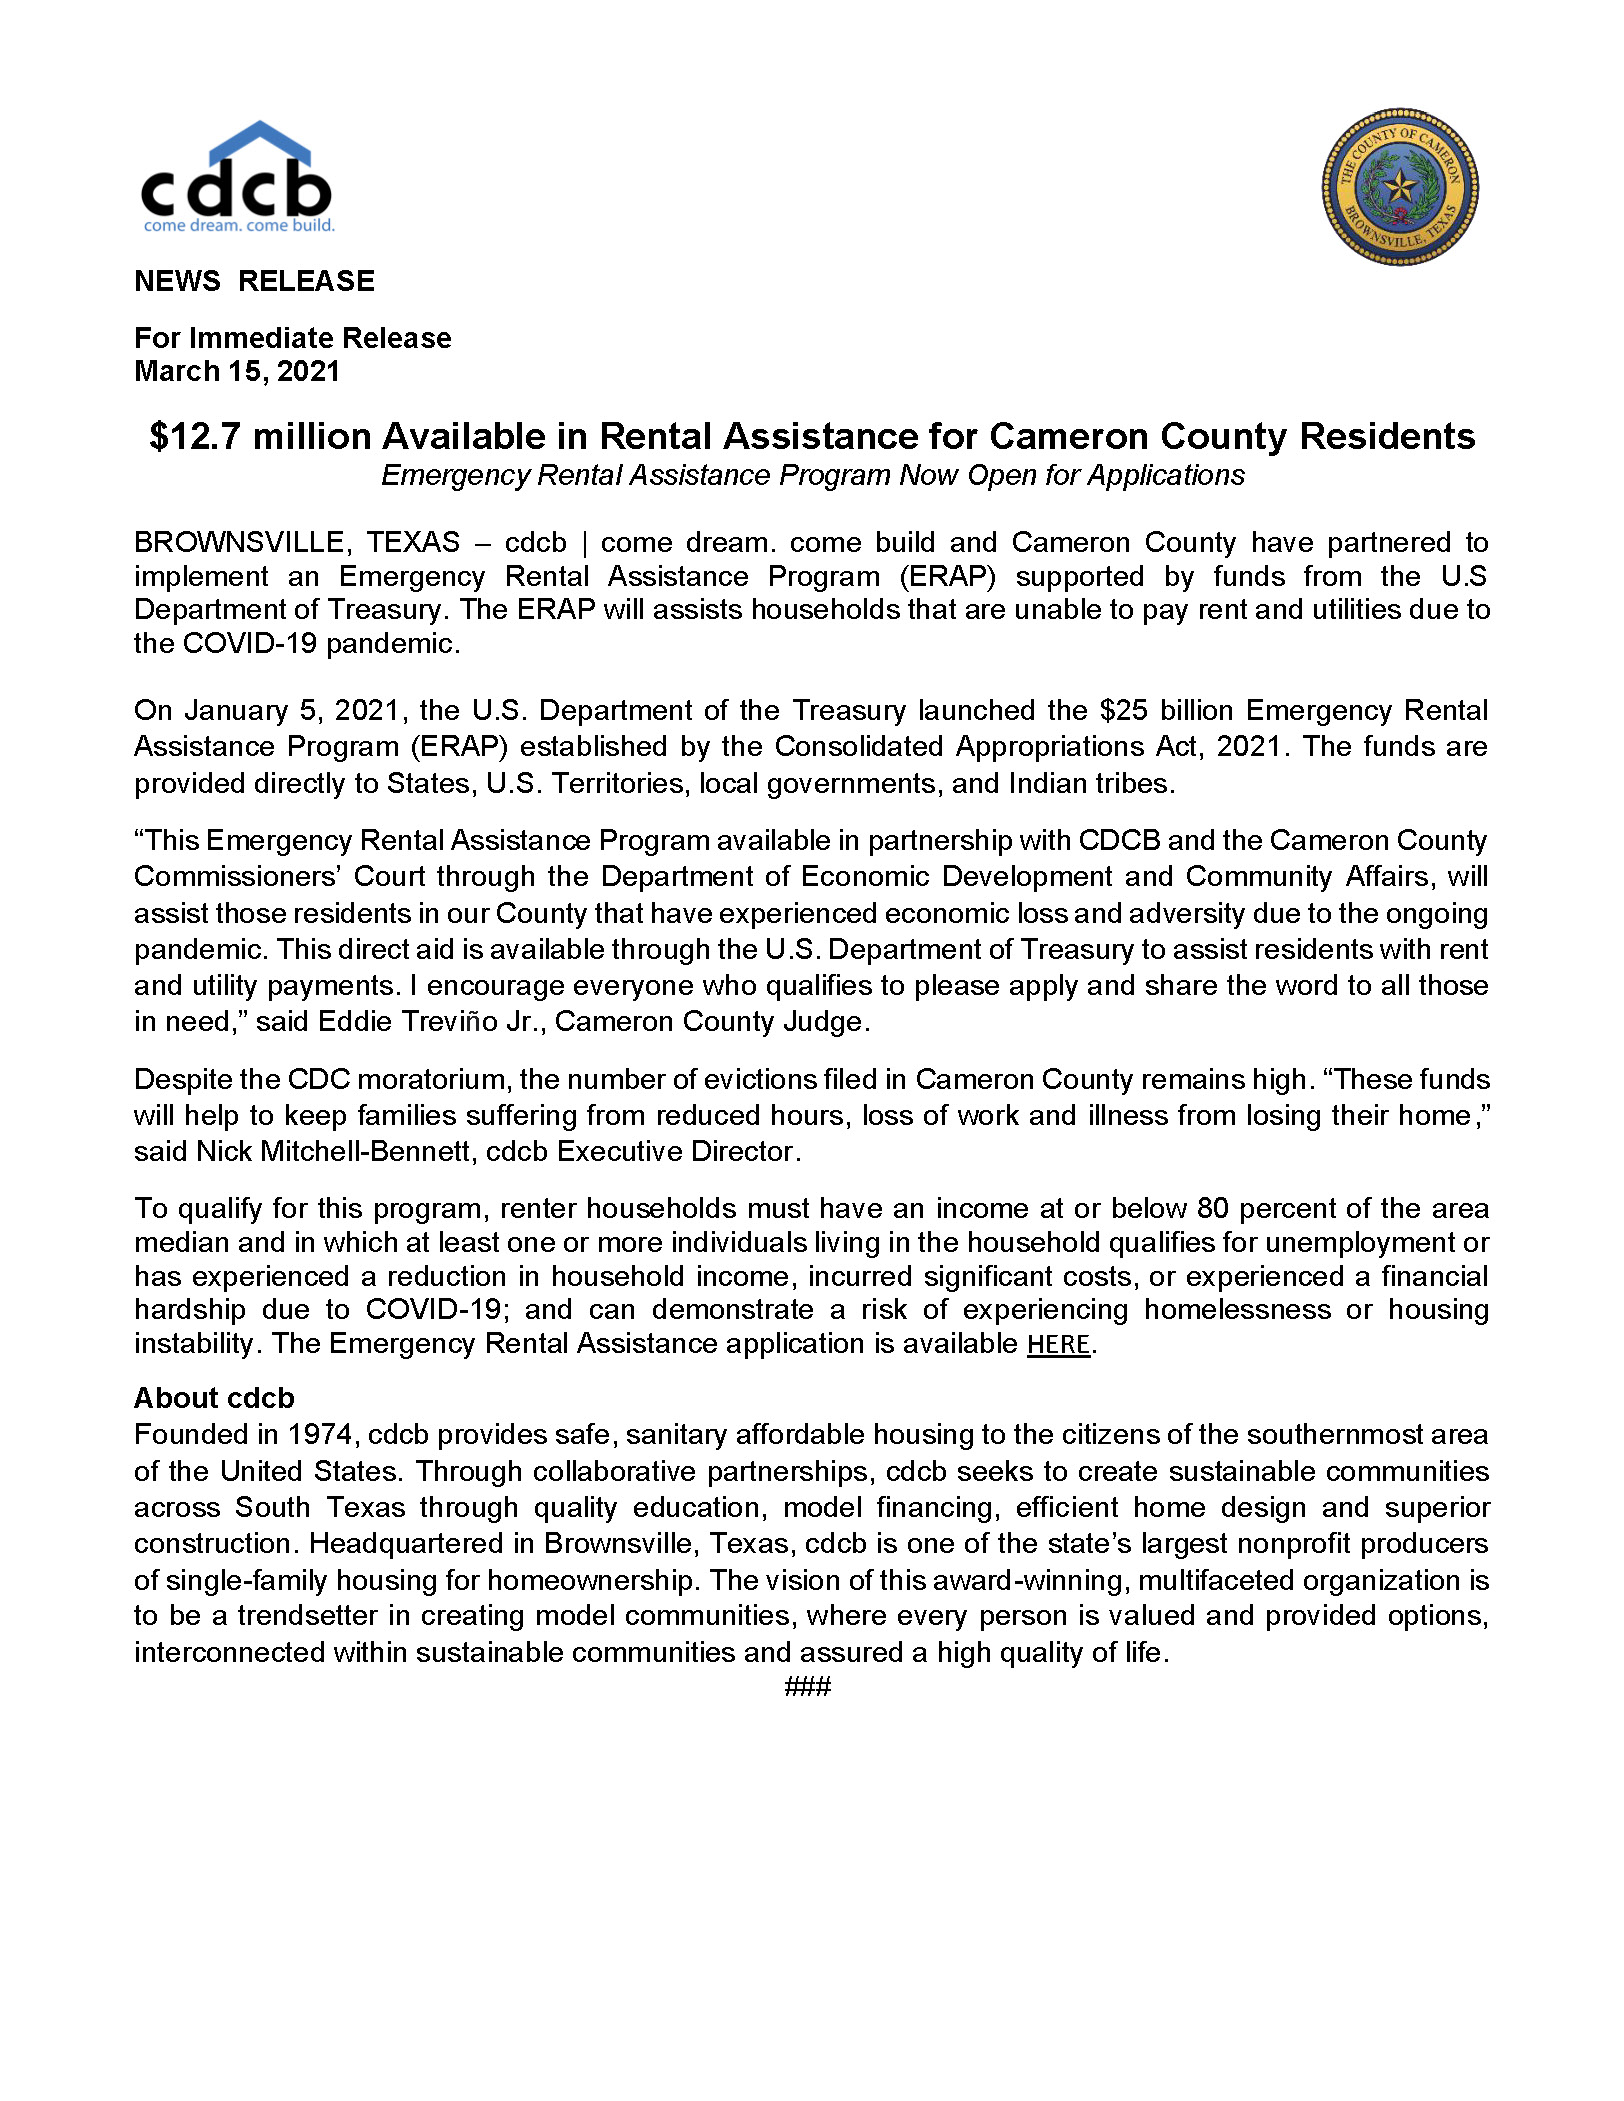 ERA Cameron County Cdcb